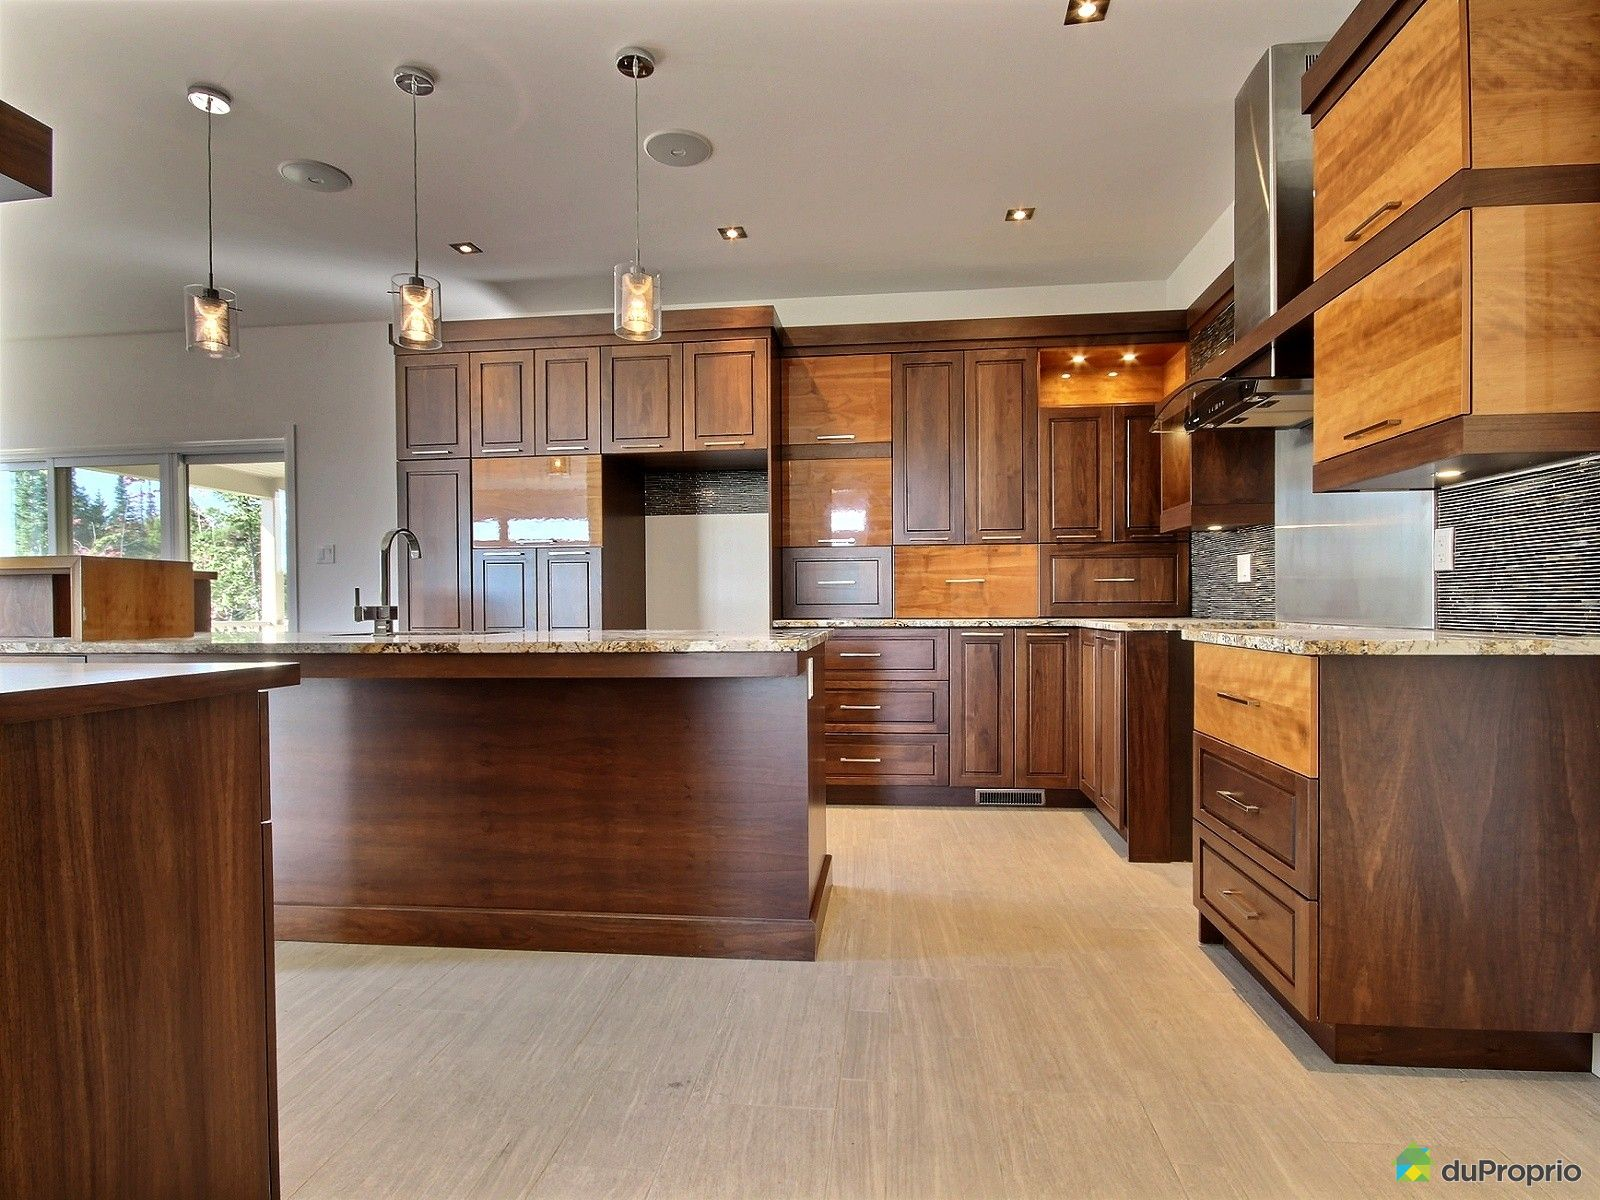 maison neuve vendre boischatel 509 rue des rochers immobilier qu bec duproprio 547702. Black Bedroom Furniture Sets. Home Design Ideas